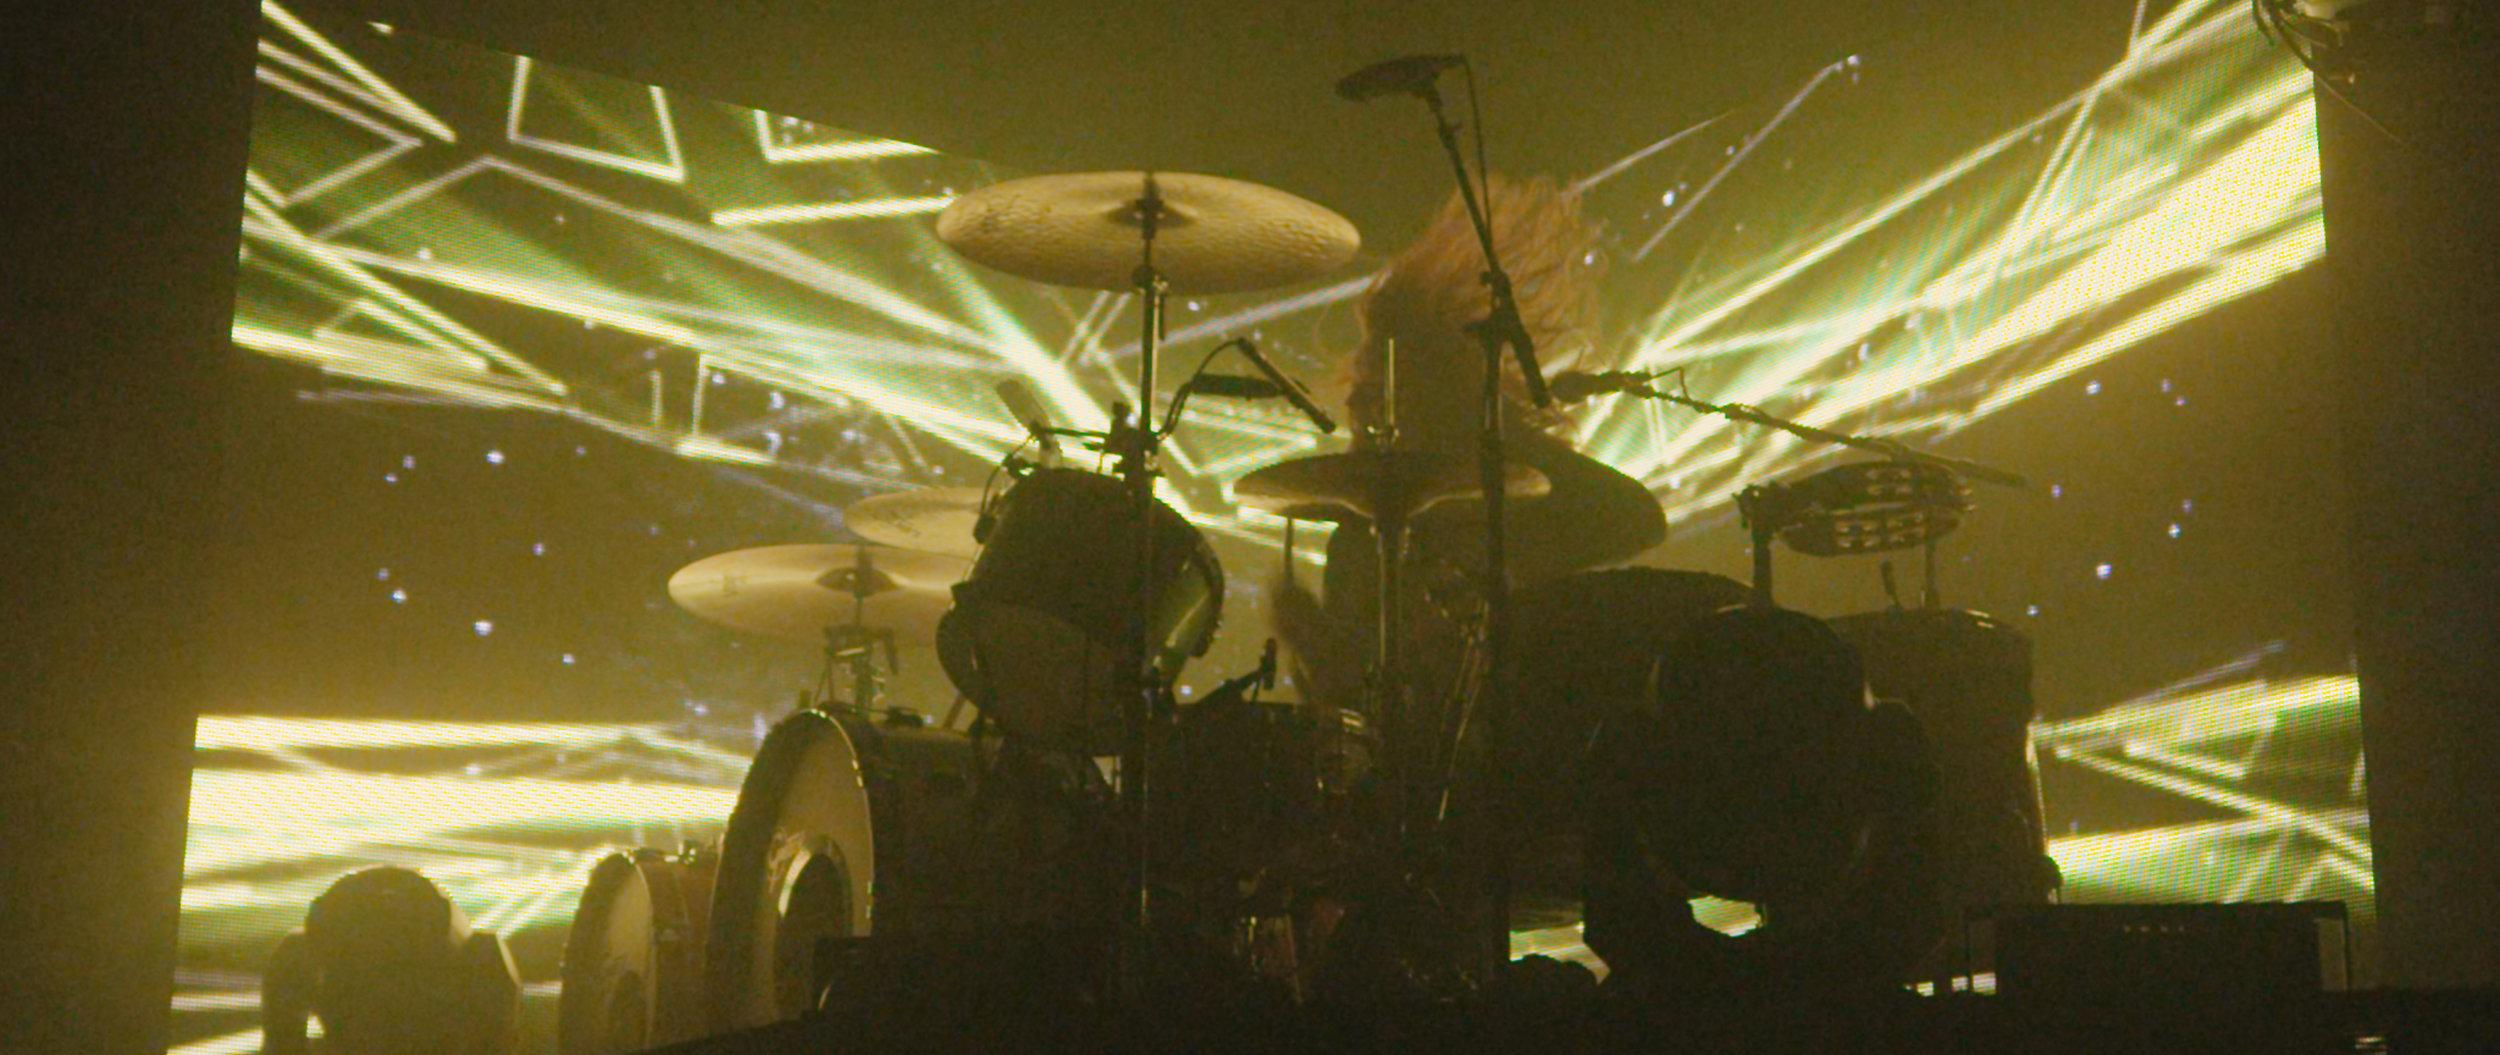 uo cray drums.jpg